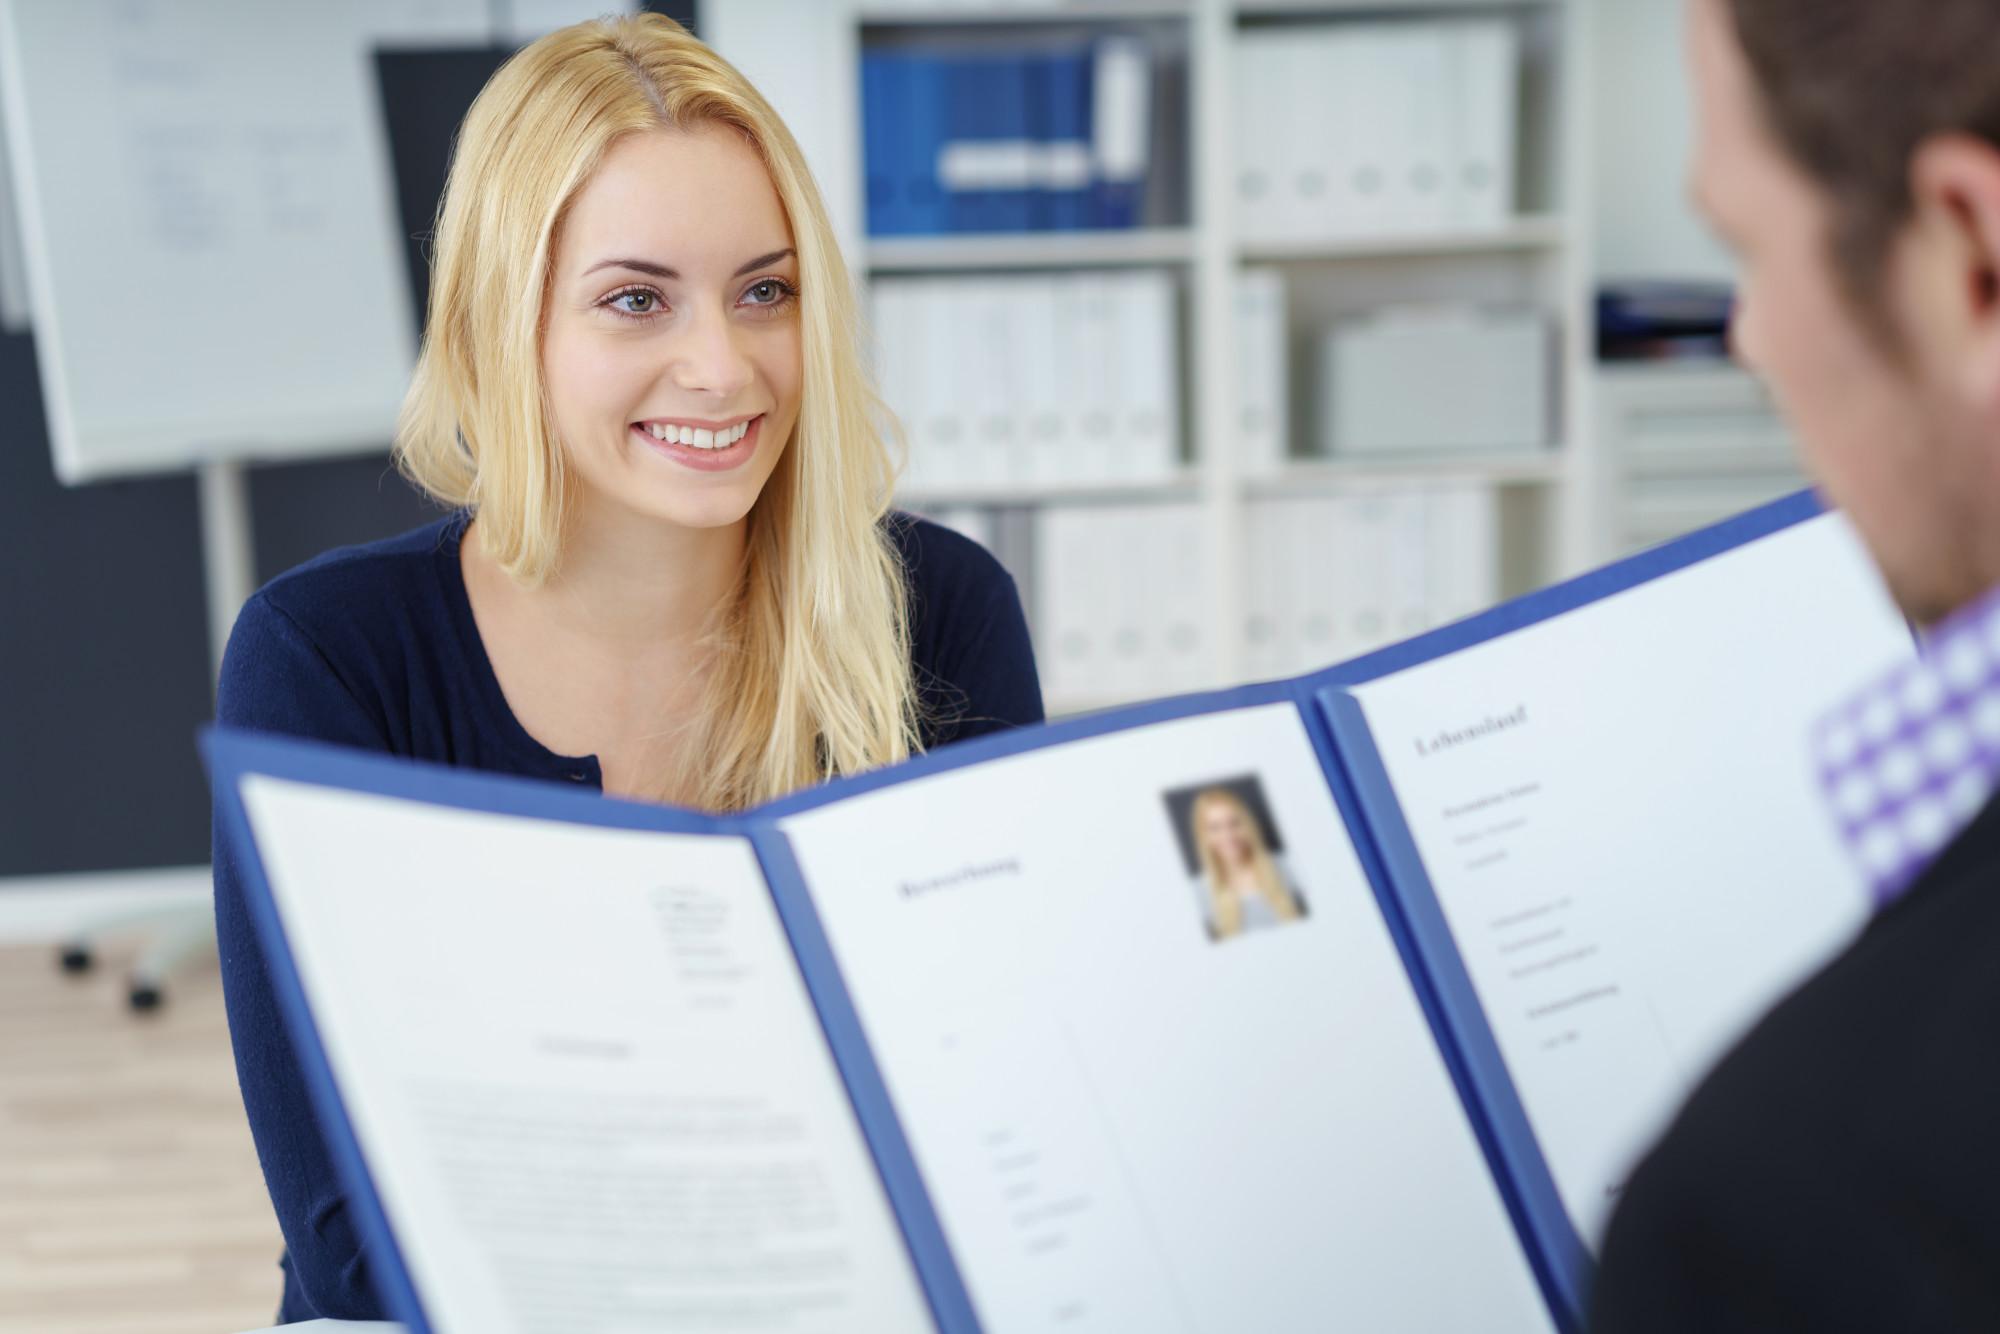 6 Inherent Qualities of an Ideal Employee